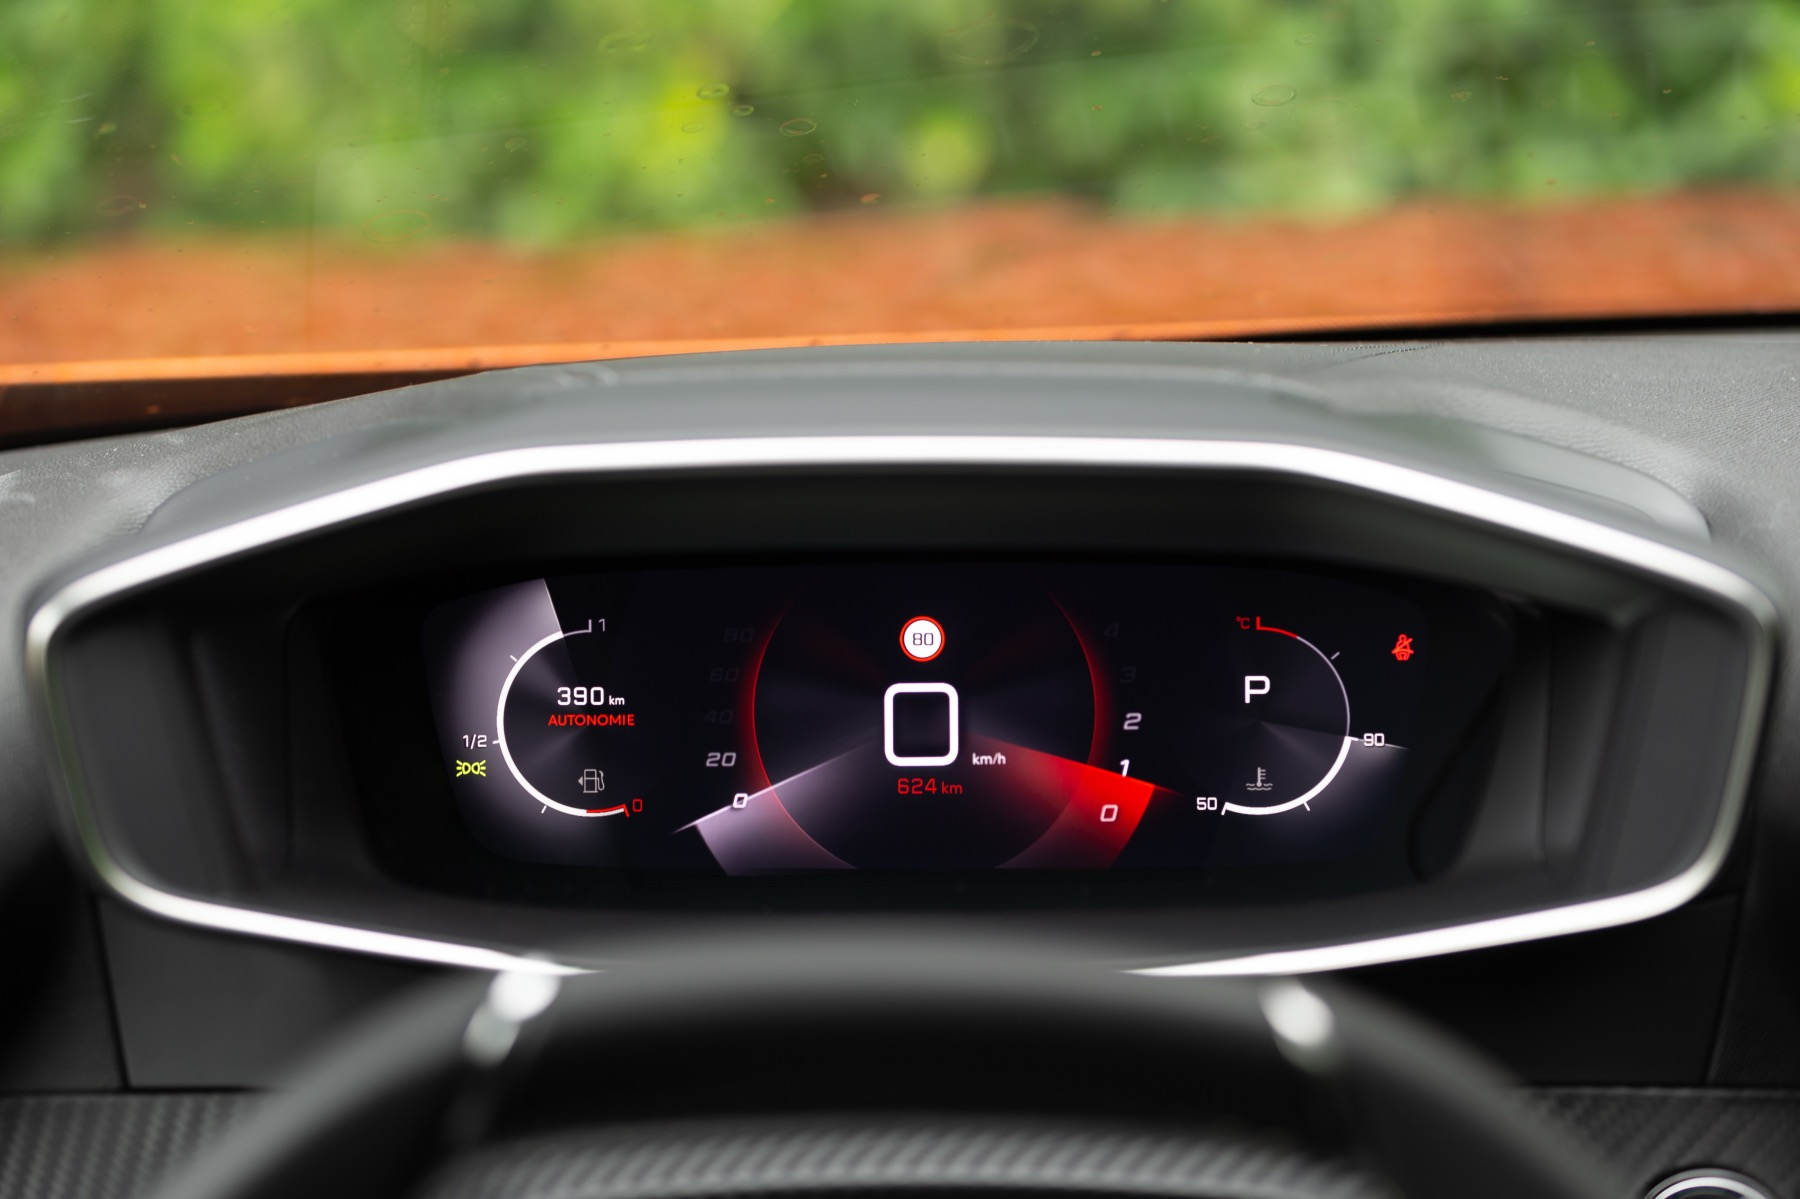 Peugeot e-2008 / i-Cockpit 3D